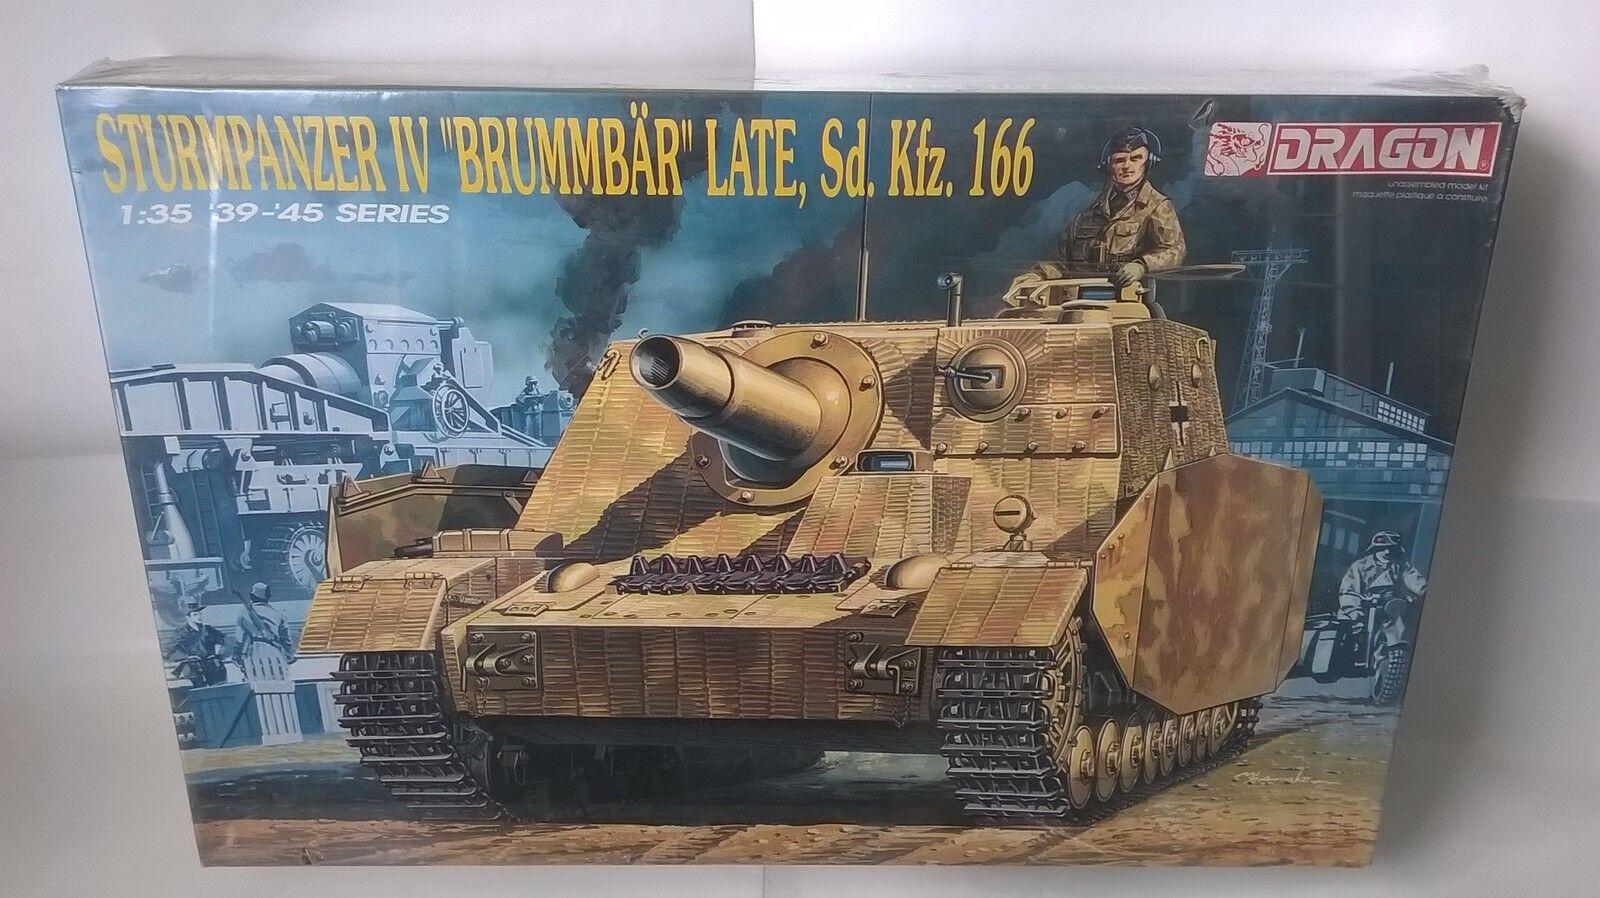 KIT DRAGON 1 35 35 35 CARRO ARMATO STURMPANZER IV   BRUMMBAR  LATE Sd.kfz.166 ART 6026 a748f7